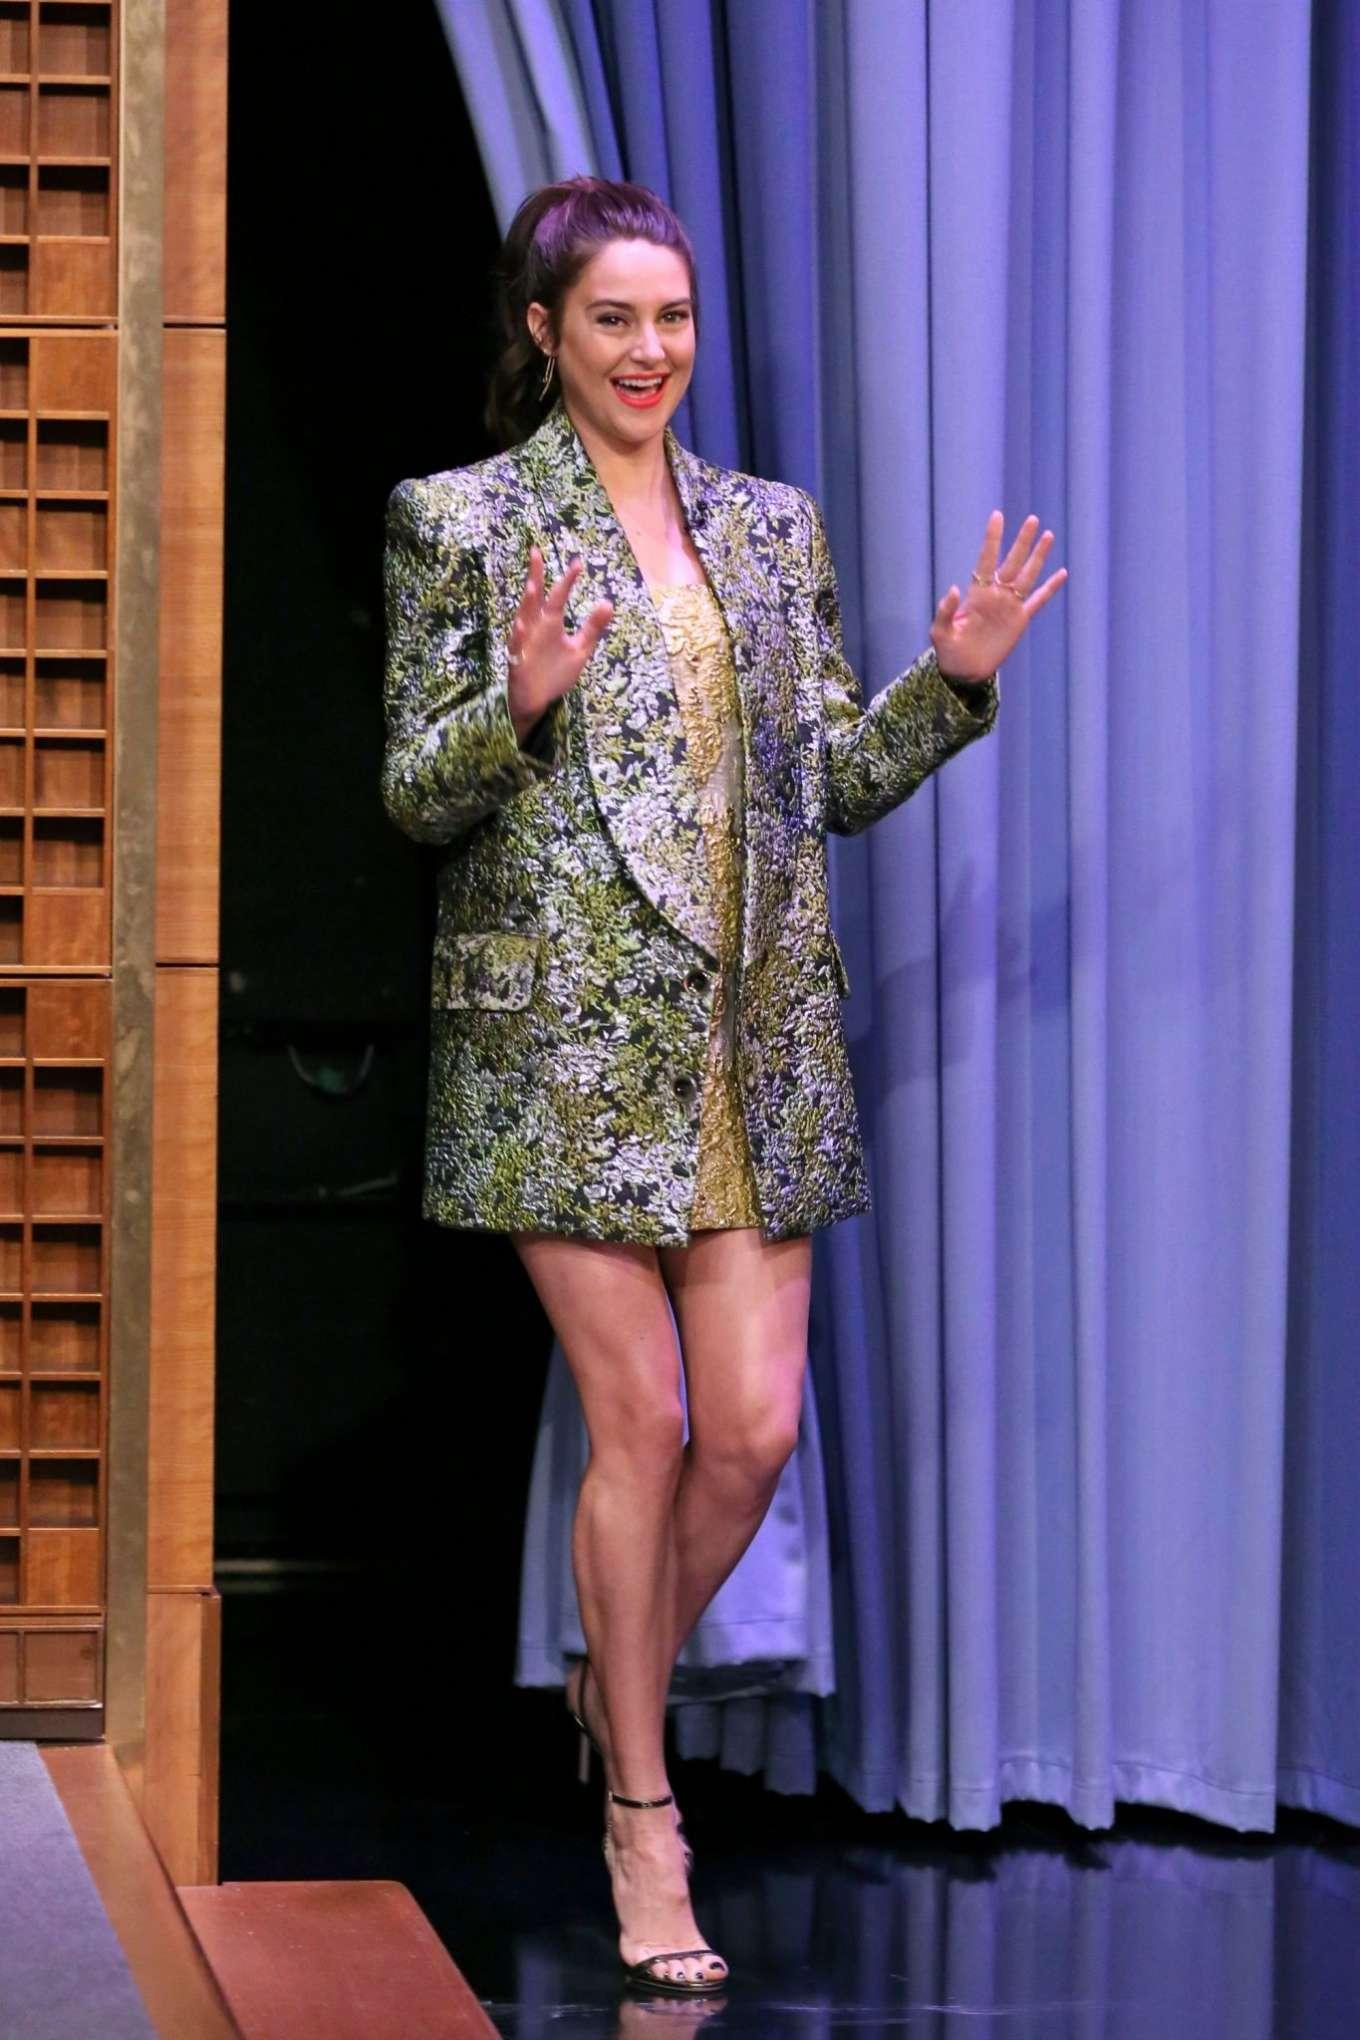 Shailene Woodley 2019 : Shailene Woodley: On The Tonight Show Starring Jimmy Fallon-06